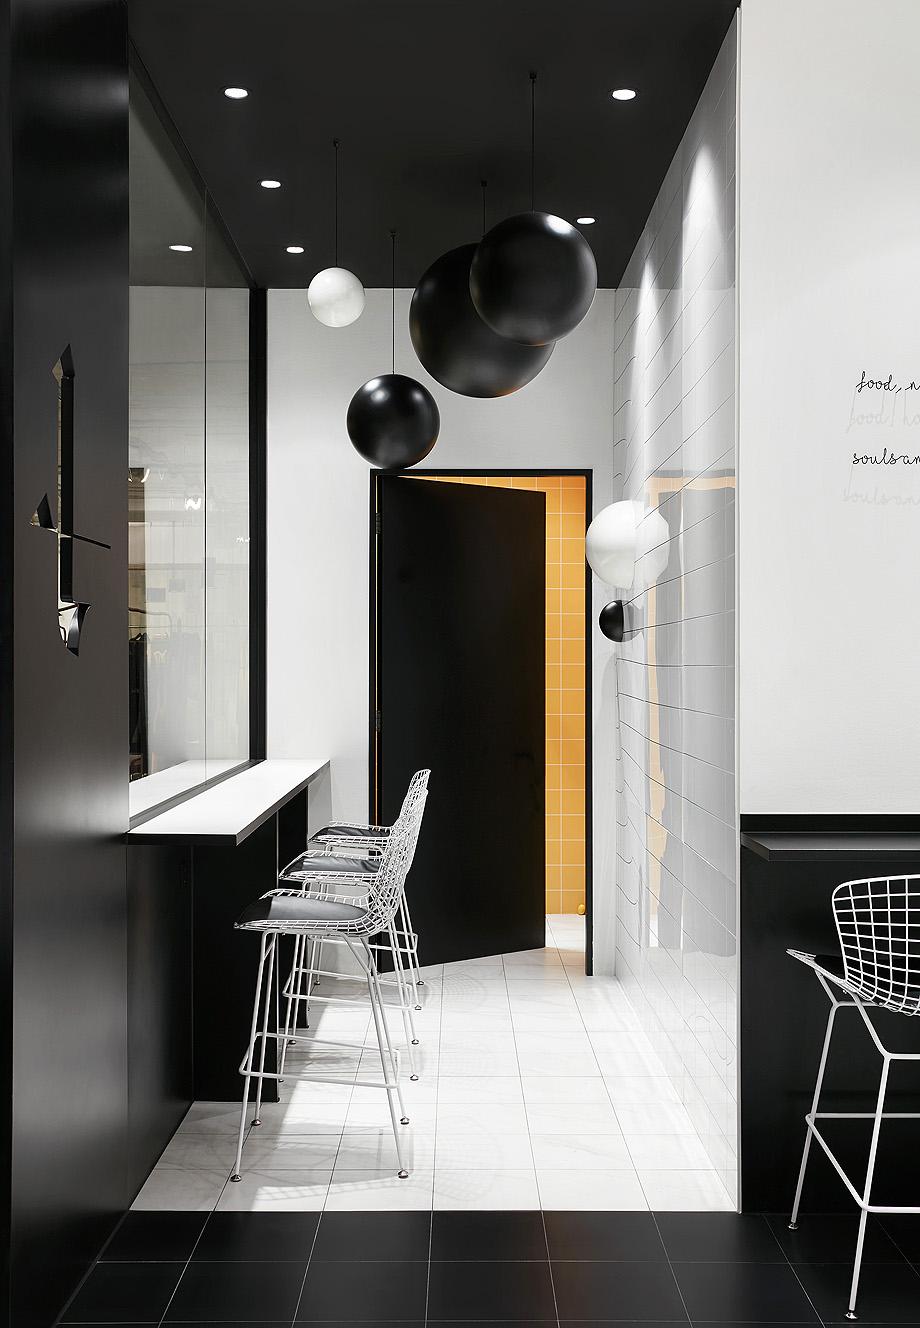 restaurante tdf de leaping creative (17)